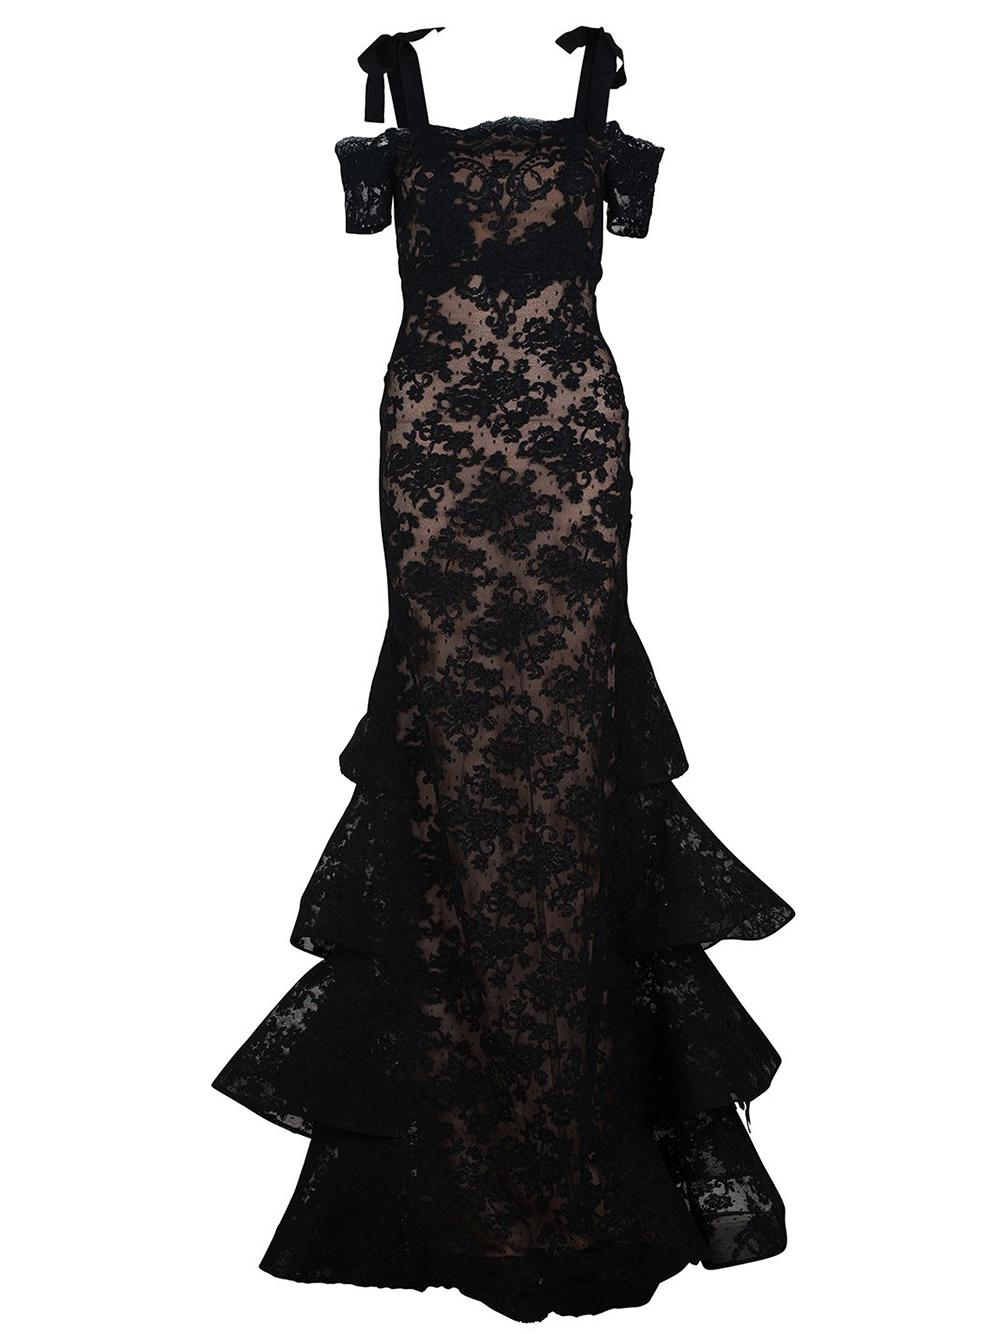 Corregio Dress Item # CORREGGIO DRESS